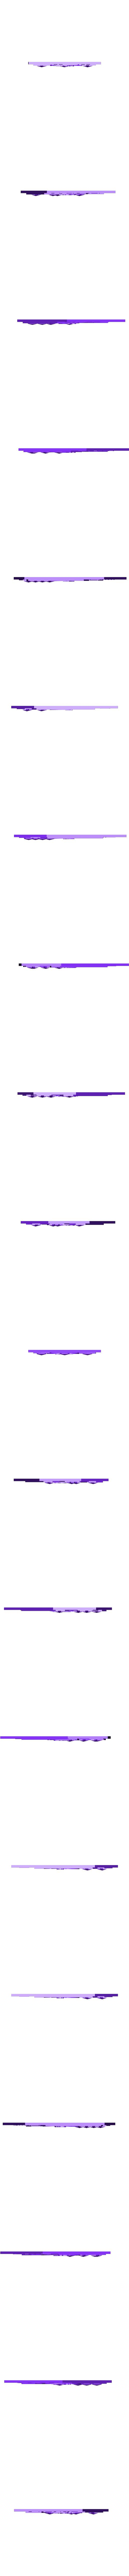 MULTI-ITALIA-V2-ETOILE-DORE.stl Télécharger fichier STL Logo italia figc • Objet imprimable en 3D, zimatera